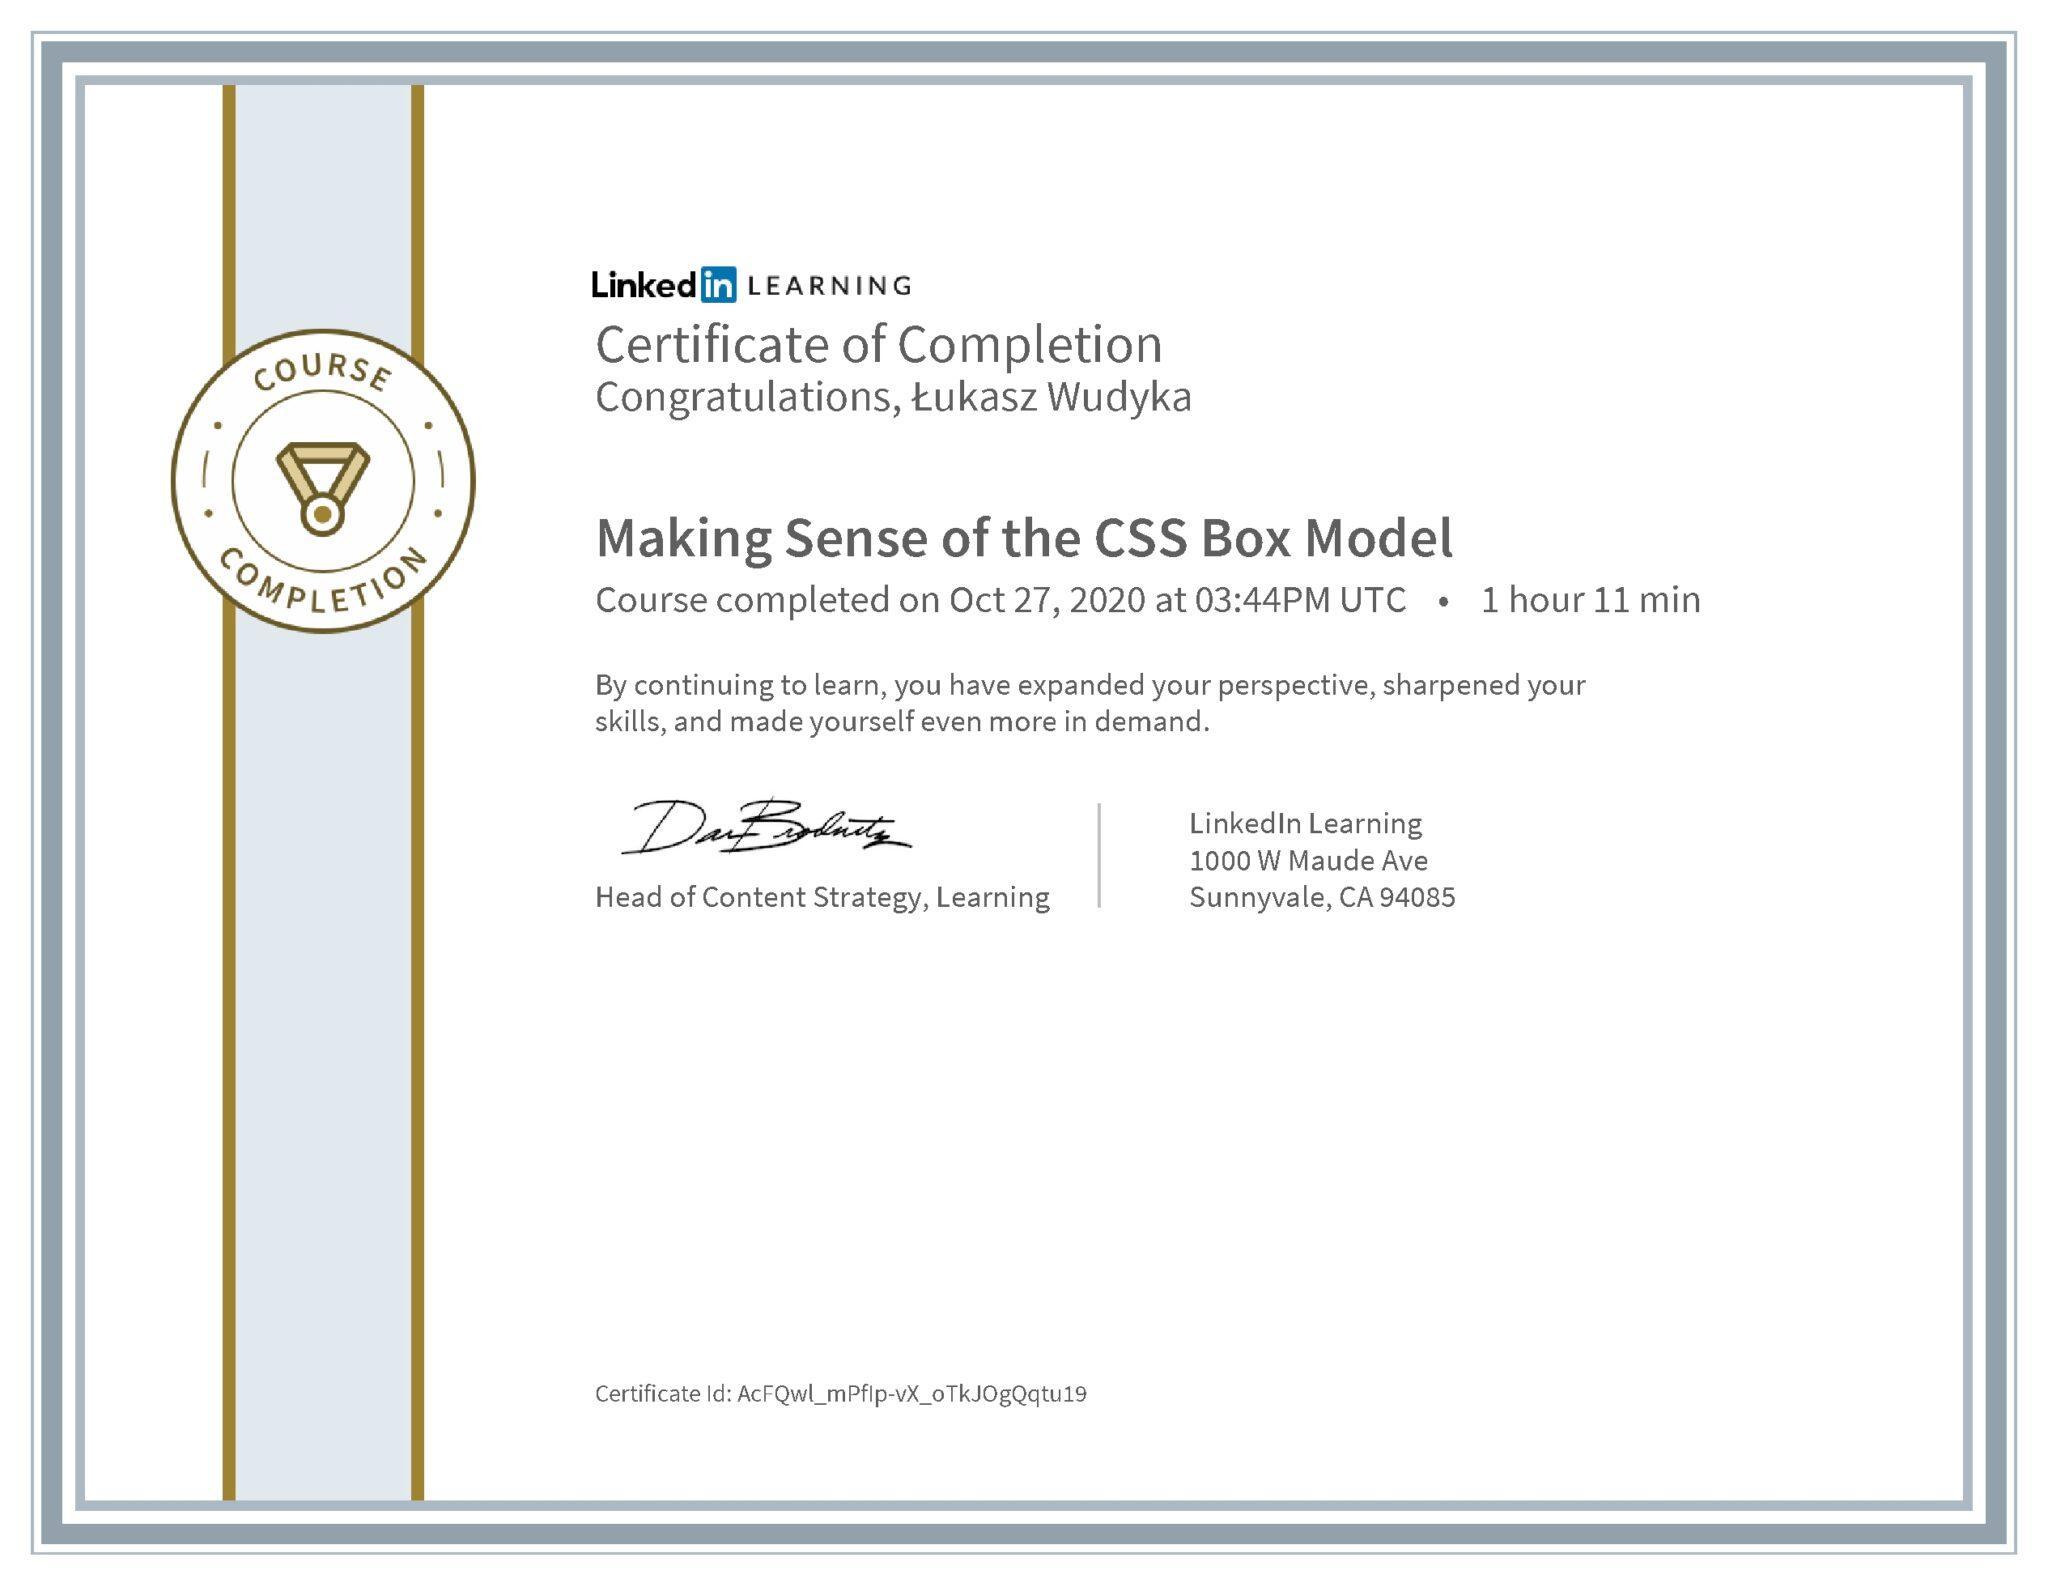 Łukasz Wudyka certyfikat LinkedIn Making Sense of the CSS Box Model